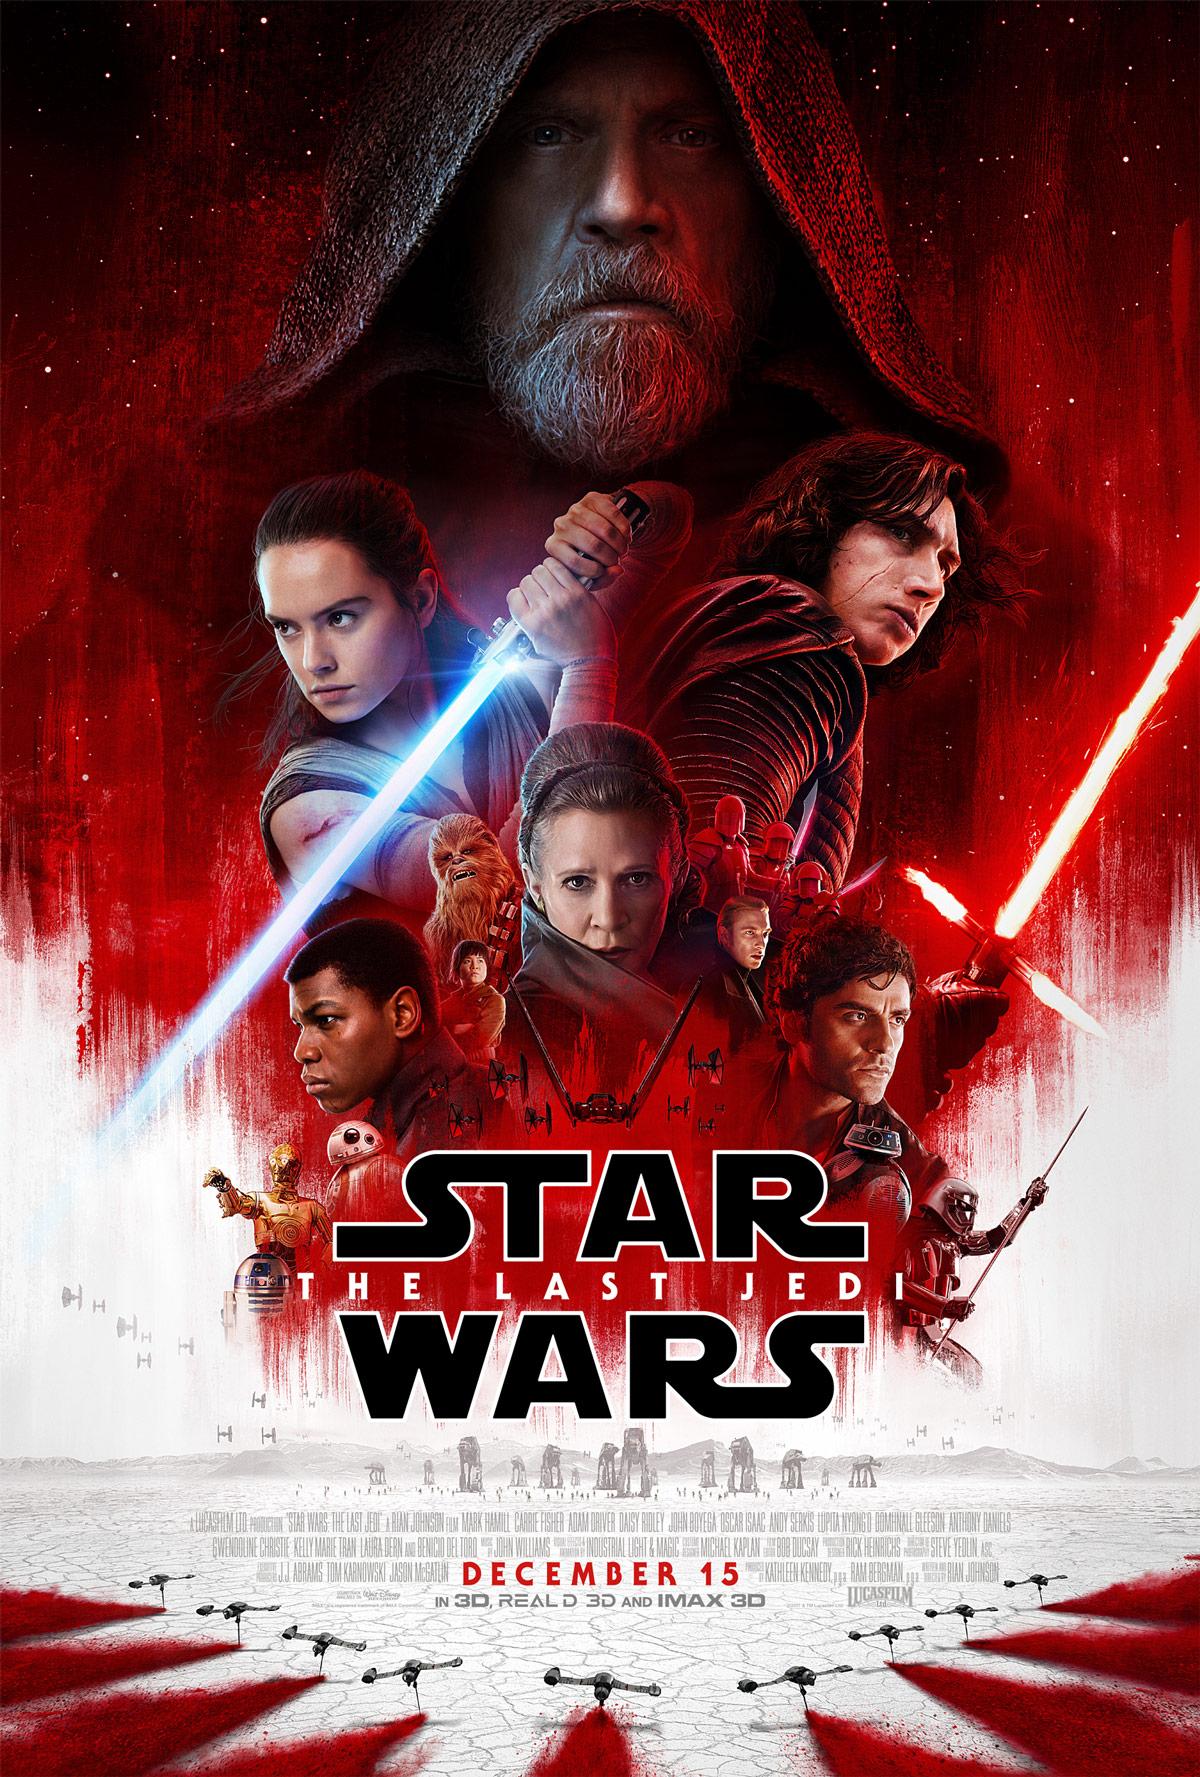 Star Wars Episode VIII: The Last Jedi   (2017) dir. Rian Johnson Rated: PG-13 image:©2017  Walt Disney Studios Motion Pictures